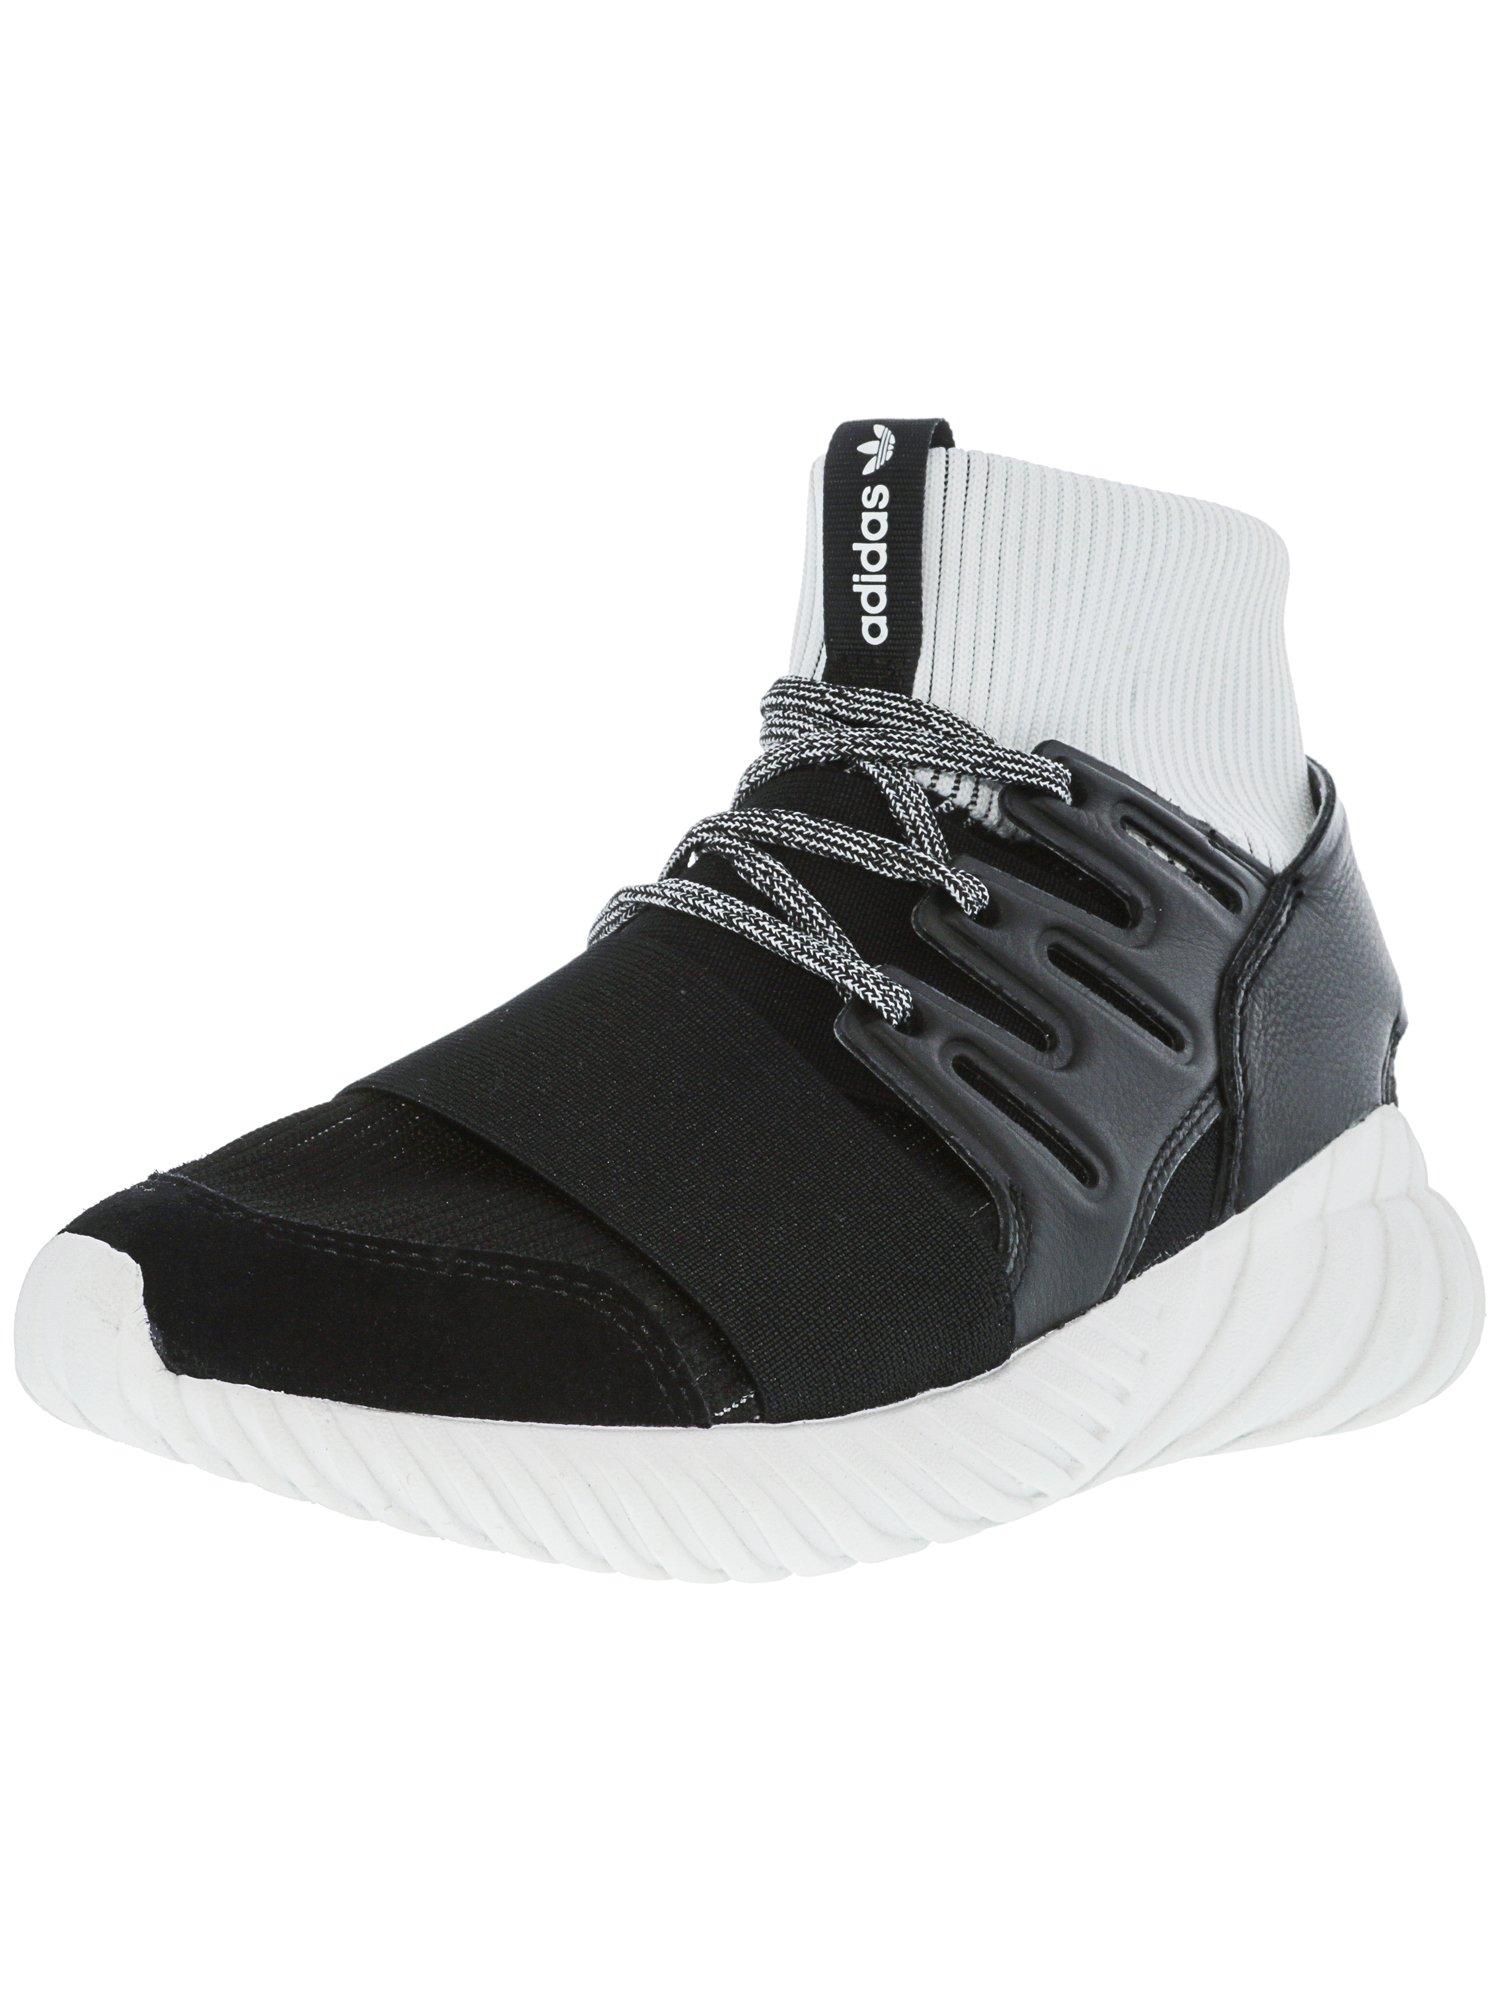 75a9f8cf76 Adidas Men's Tubular Doom High-Top Sneaker